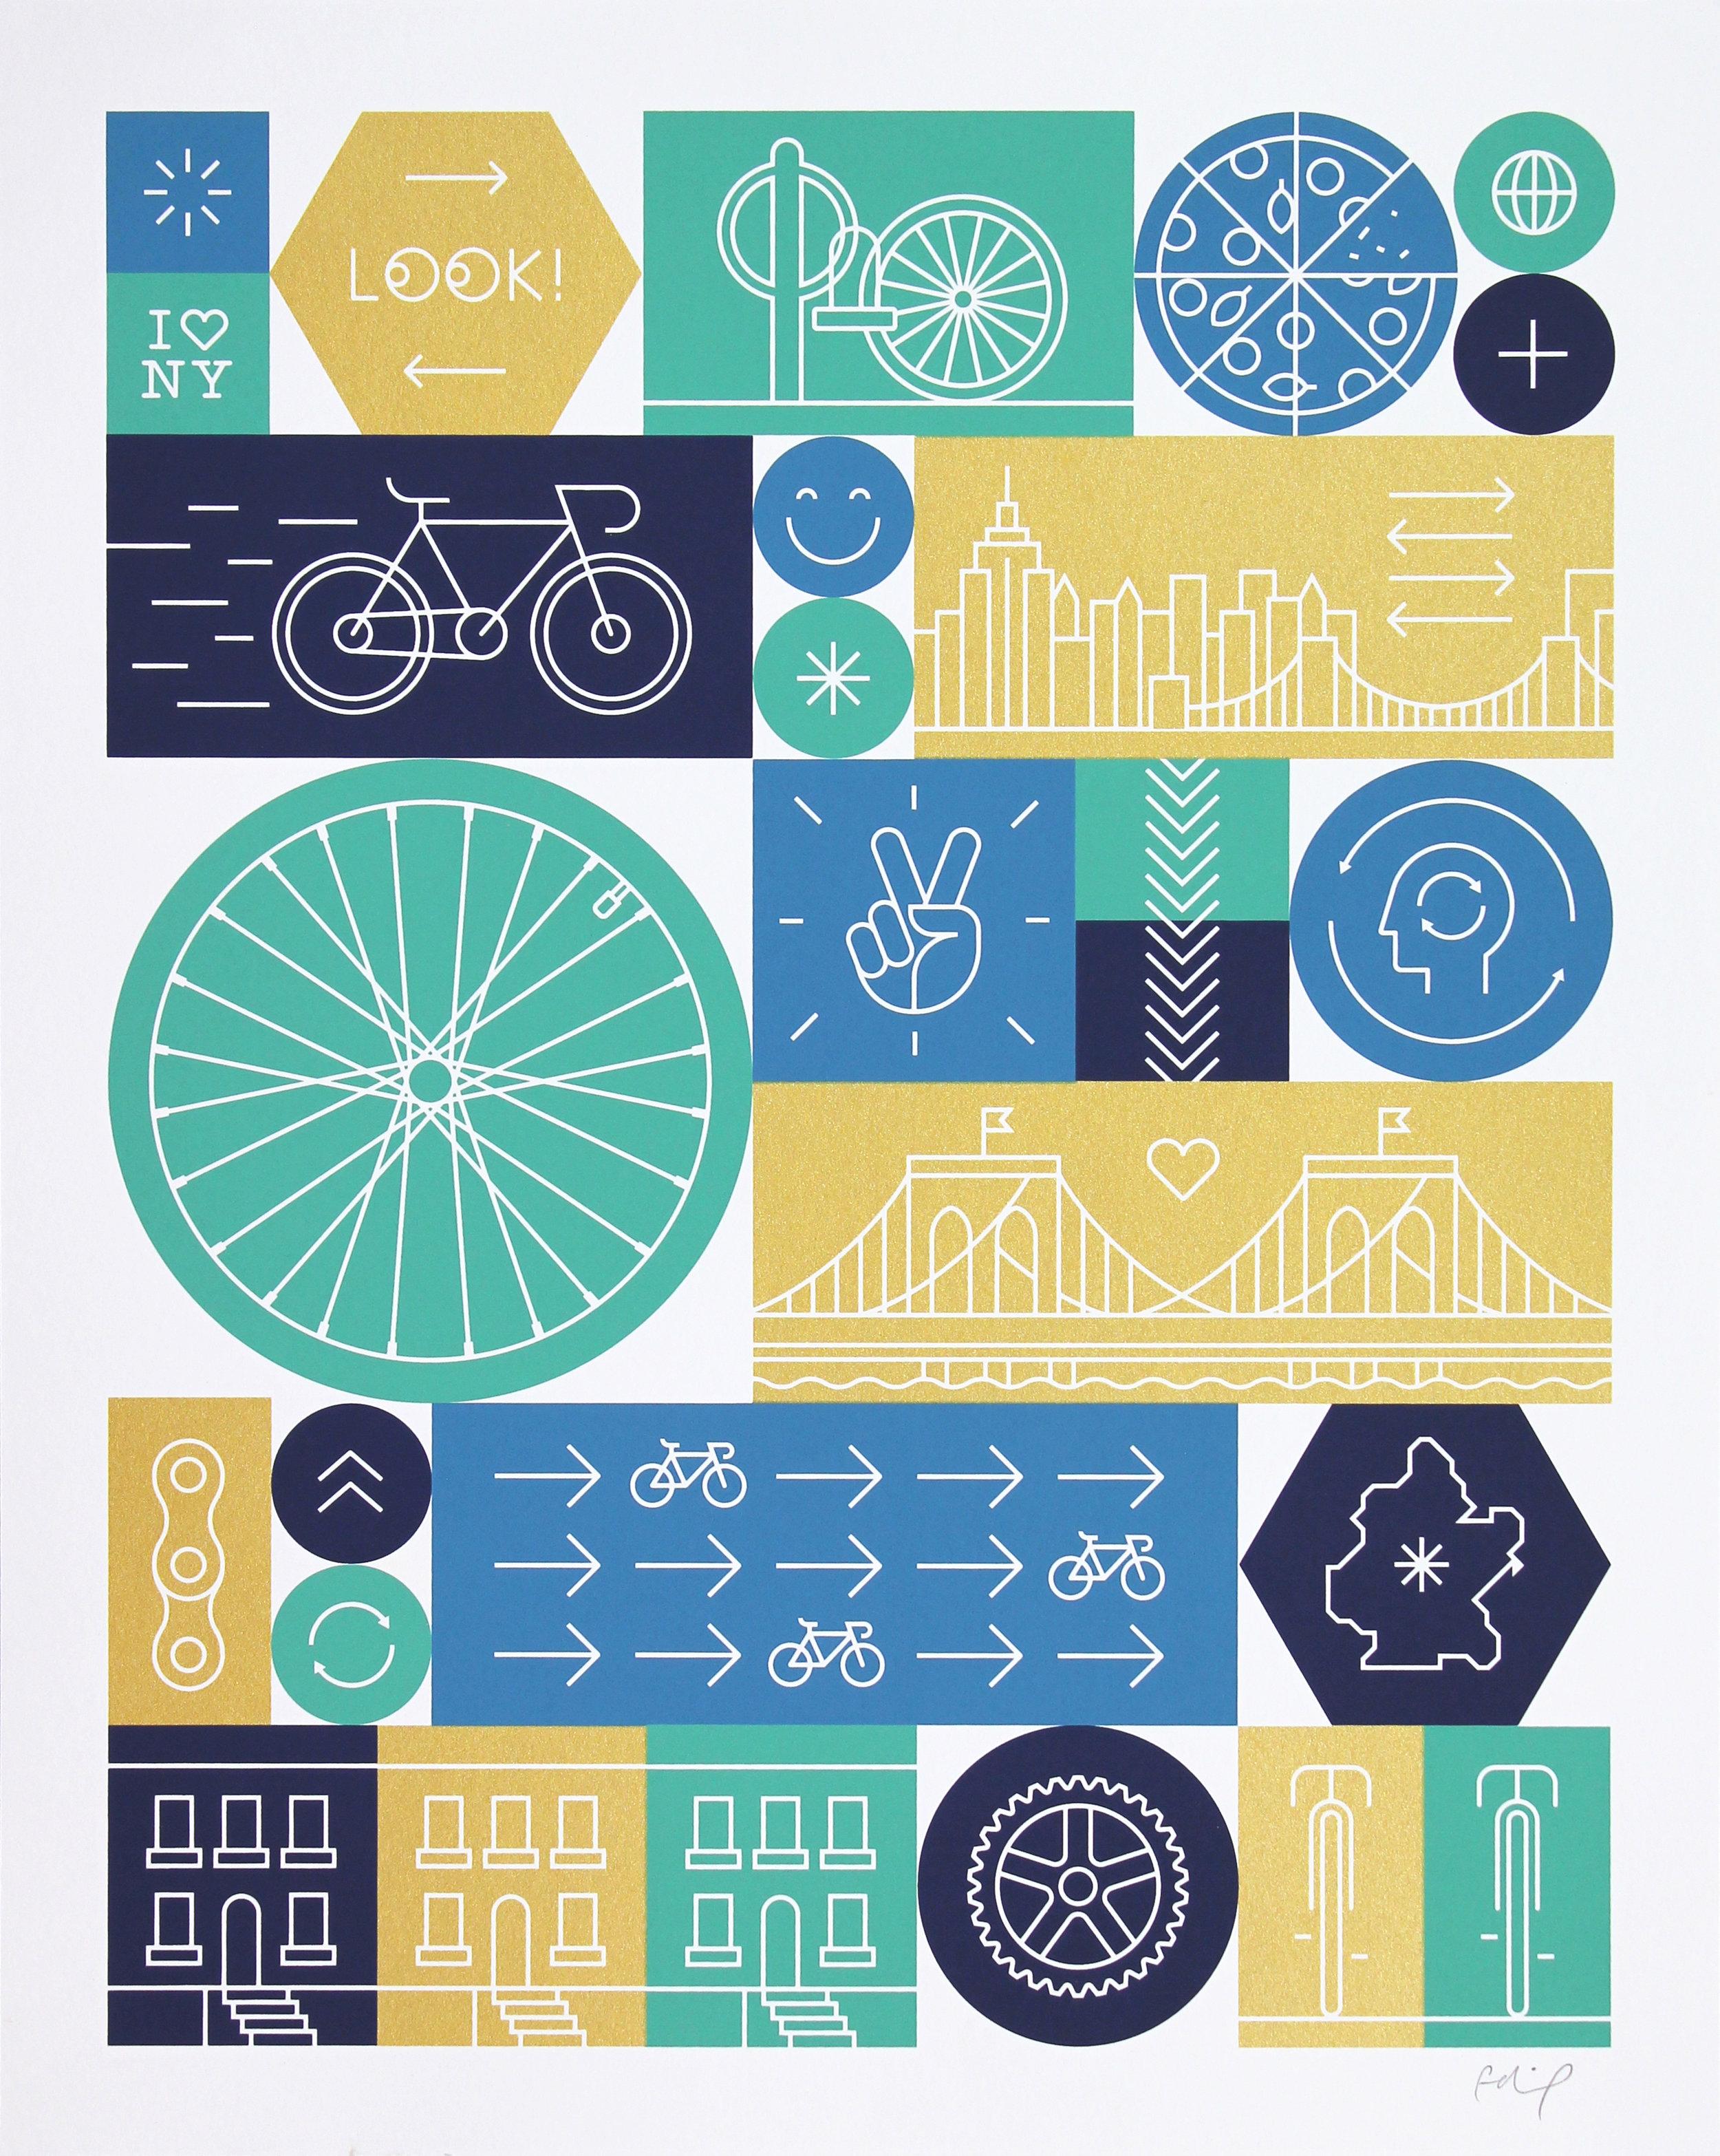 Ed Nacional - Artcrank 2014 Poster